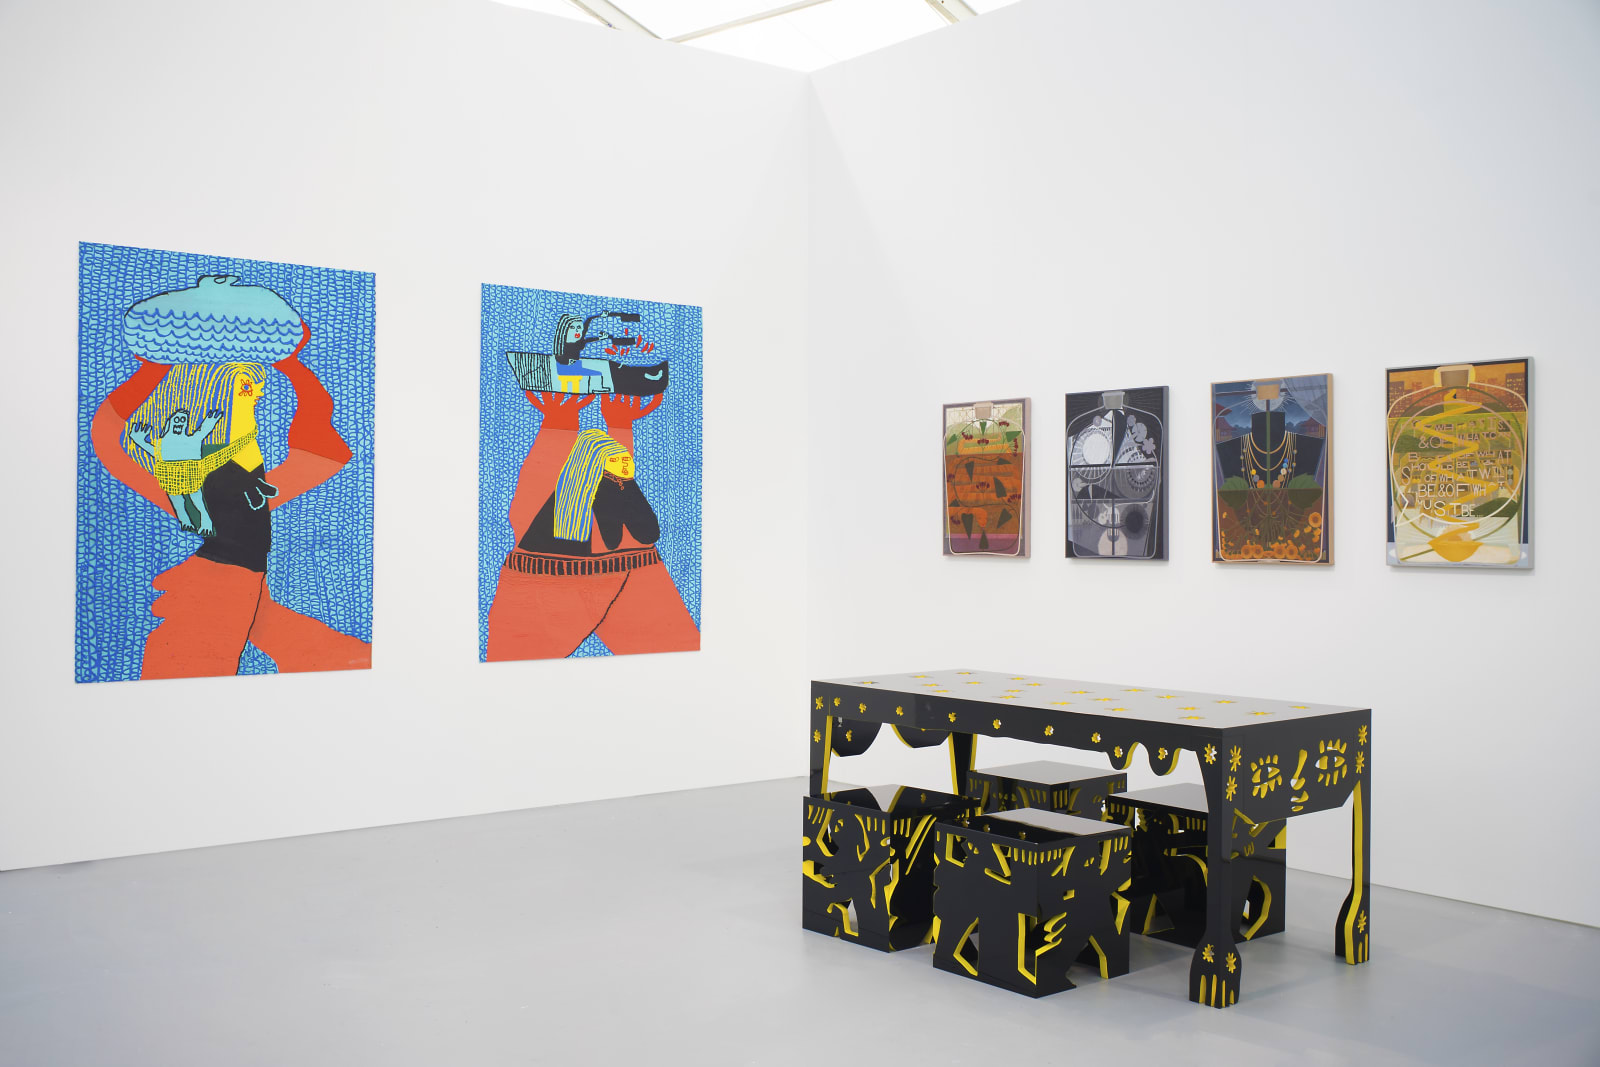 Trenton Doyle Hancock, Michael Stamm, and Summer Wheat, Untitled Miami, 2018